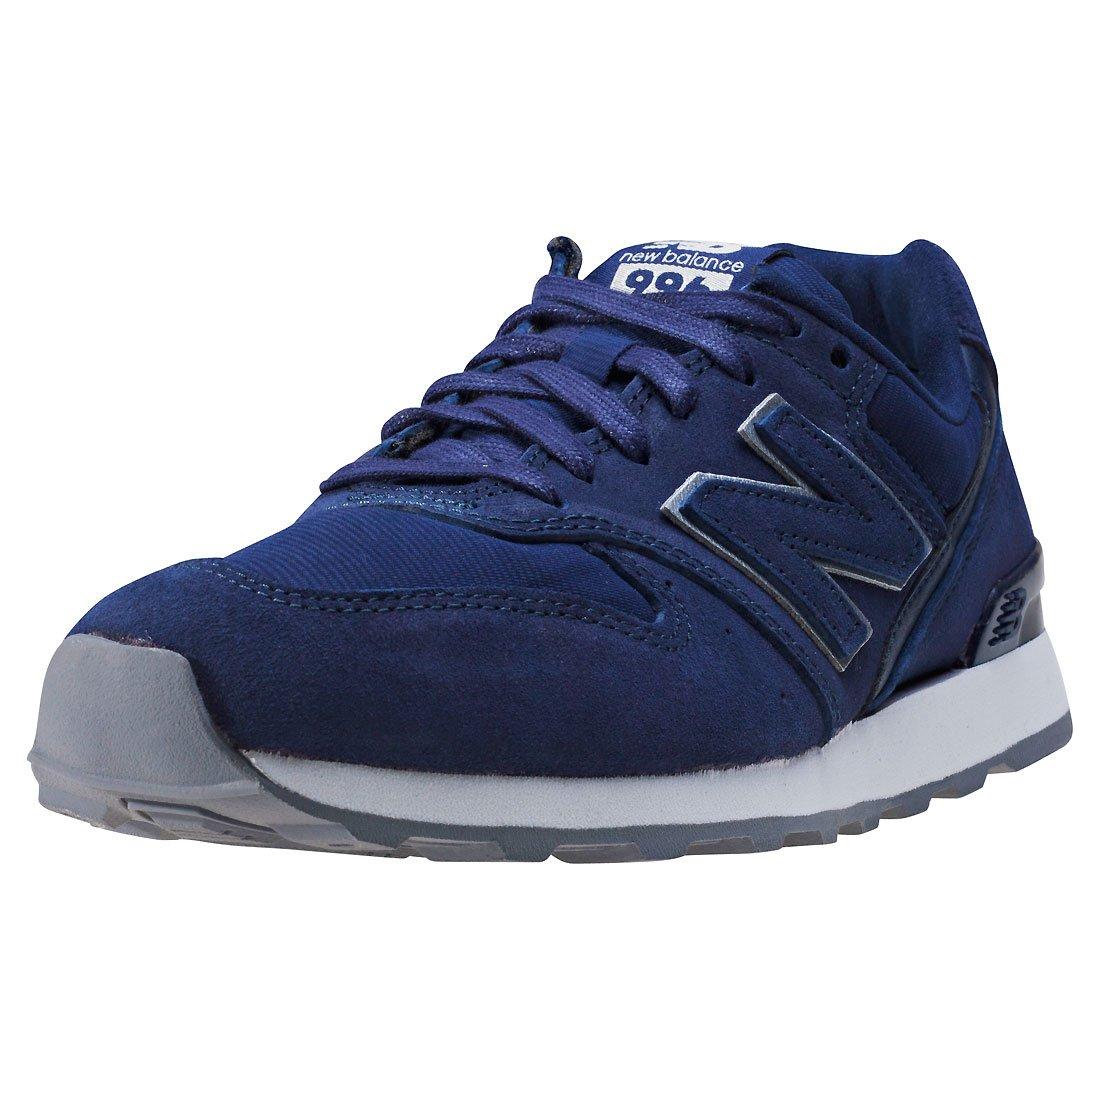 New Balance - Wr996 - Zapatillas - Purple 38 EU|Azul